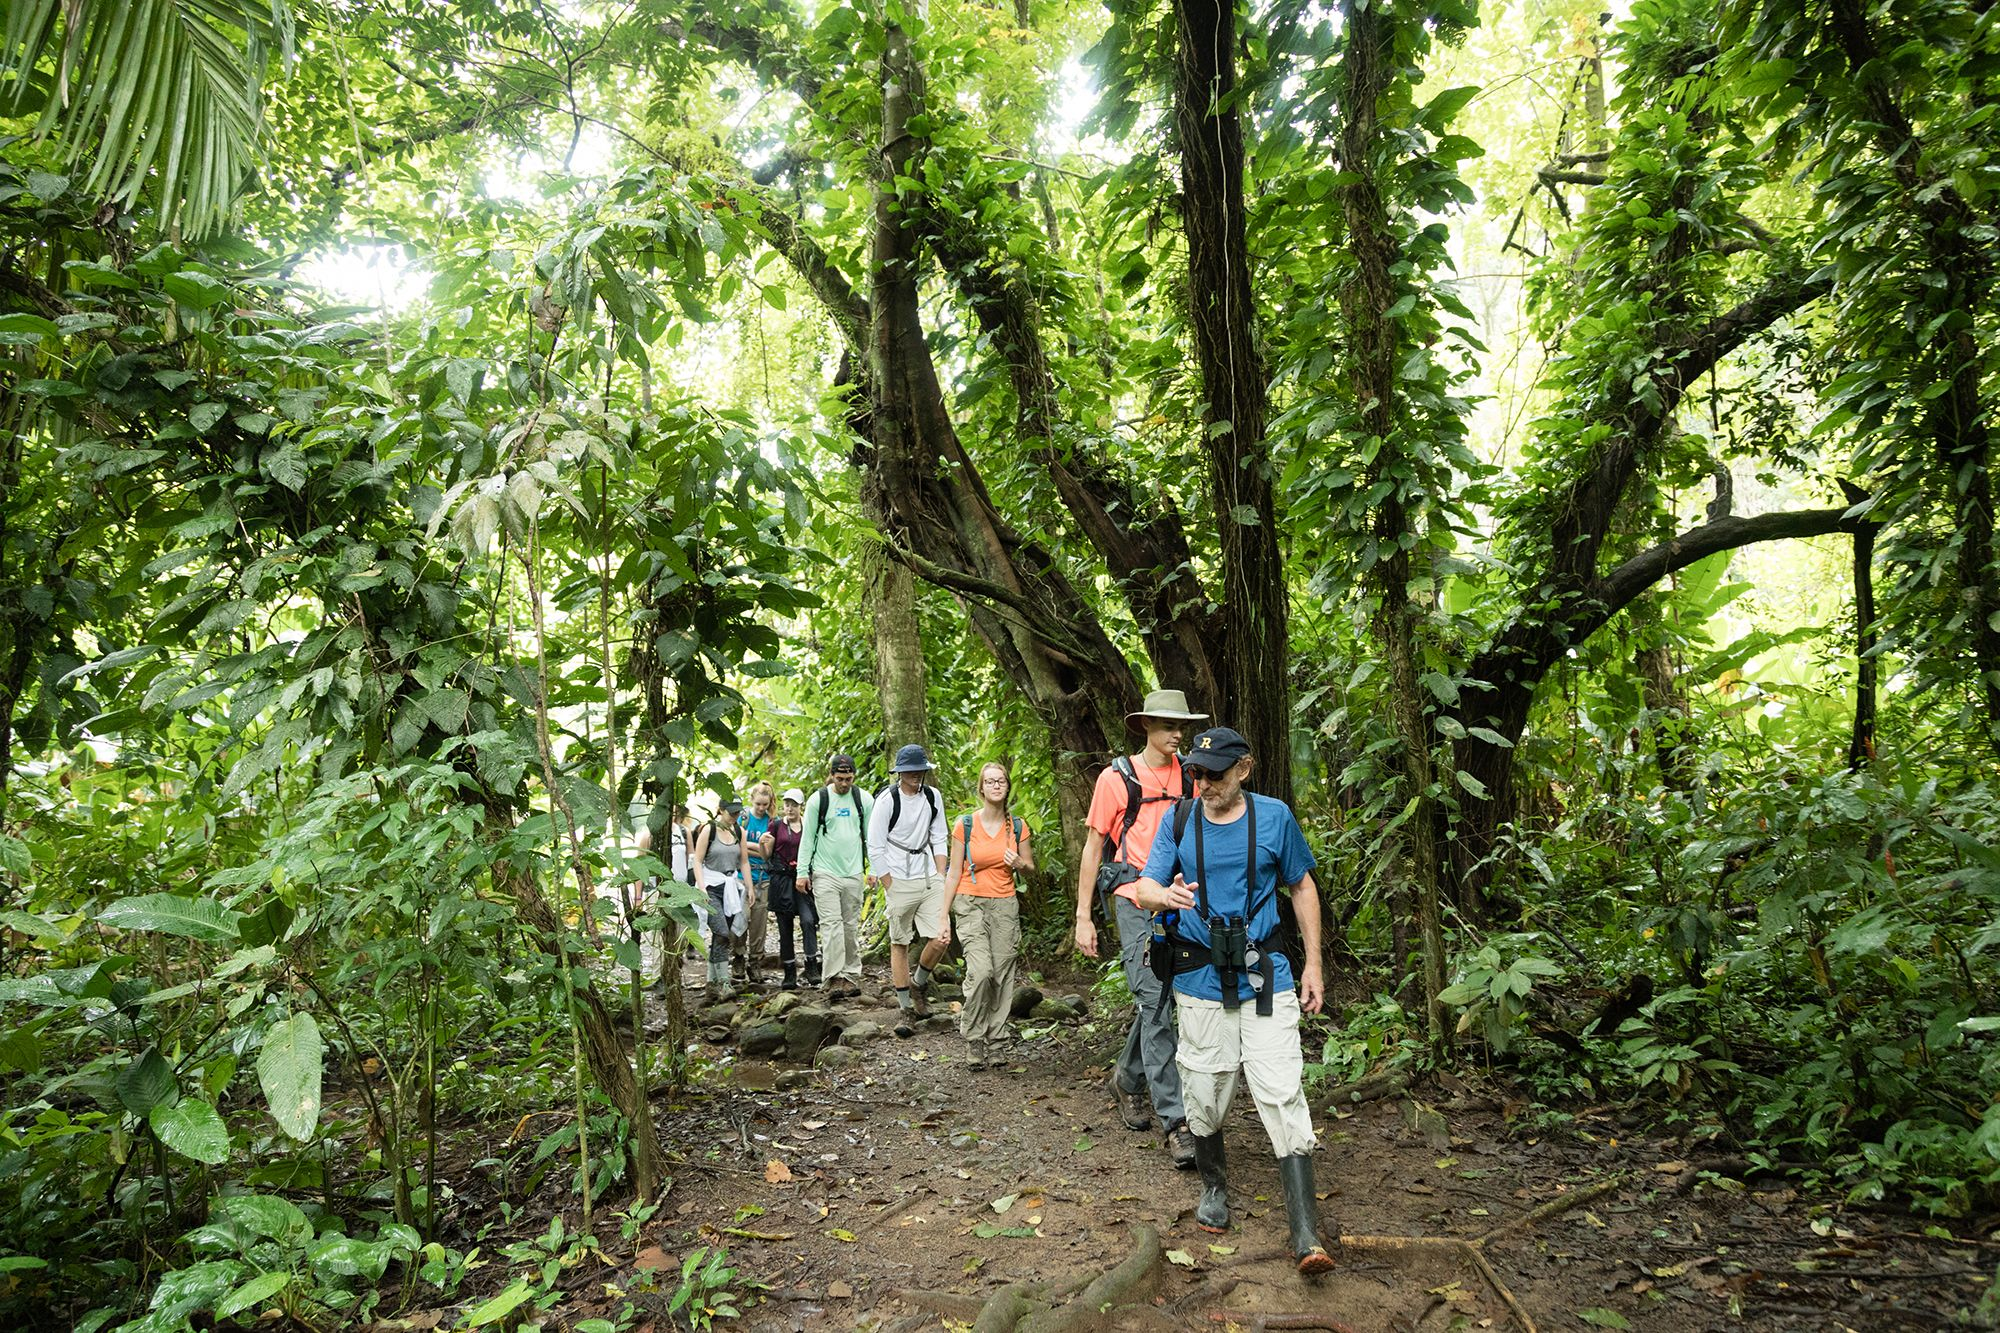 Environmental studies professor Barry Allen leading students through a Costa Rican rainforest.